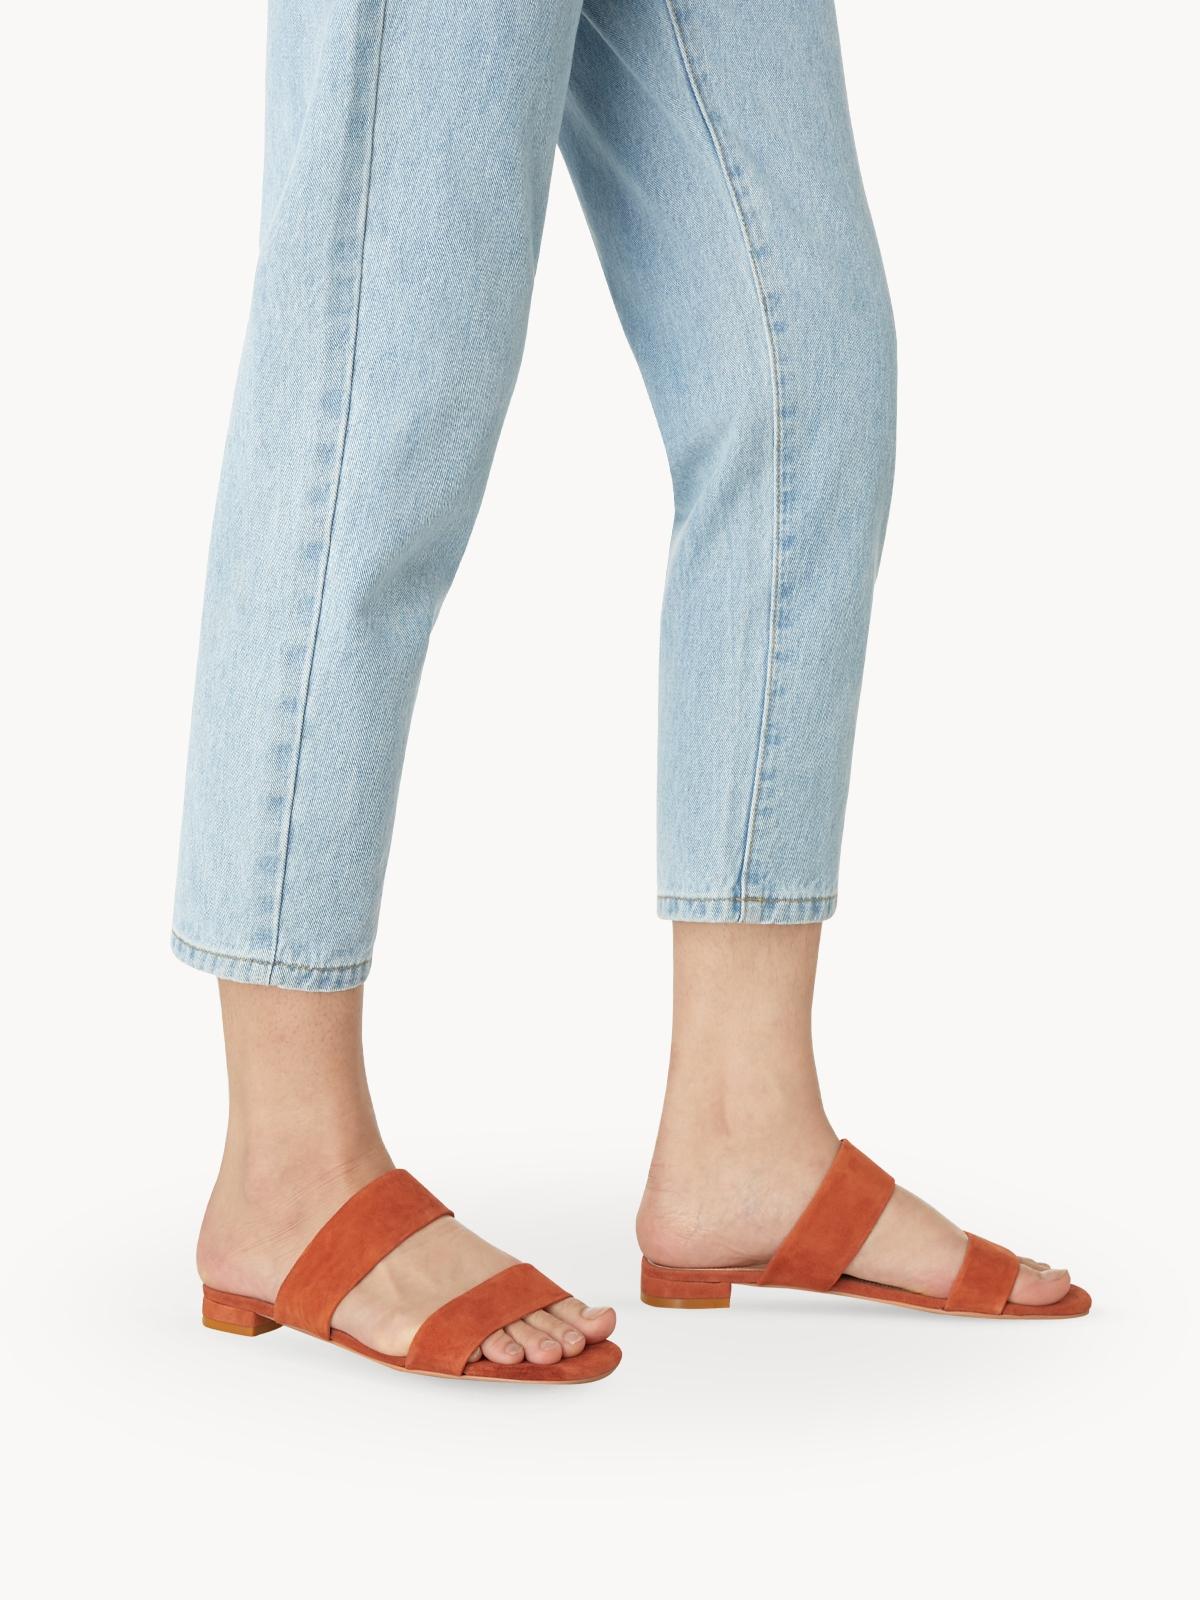 Mave Thea Sandals Orange